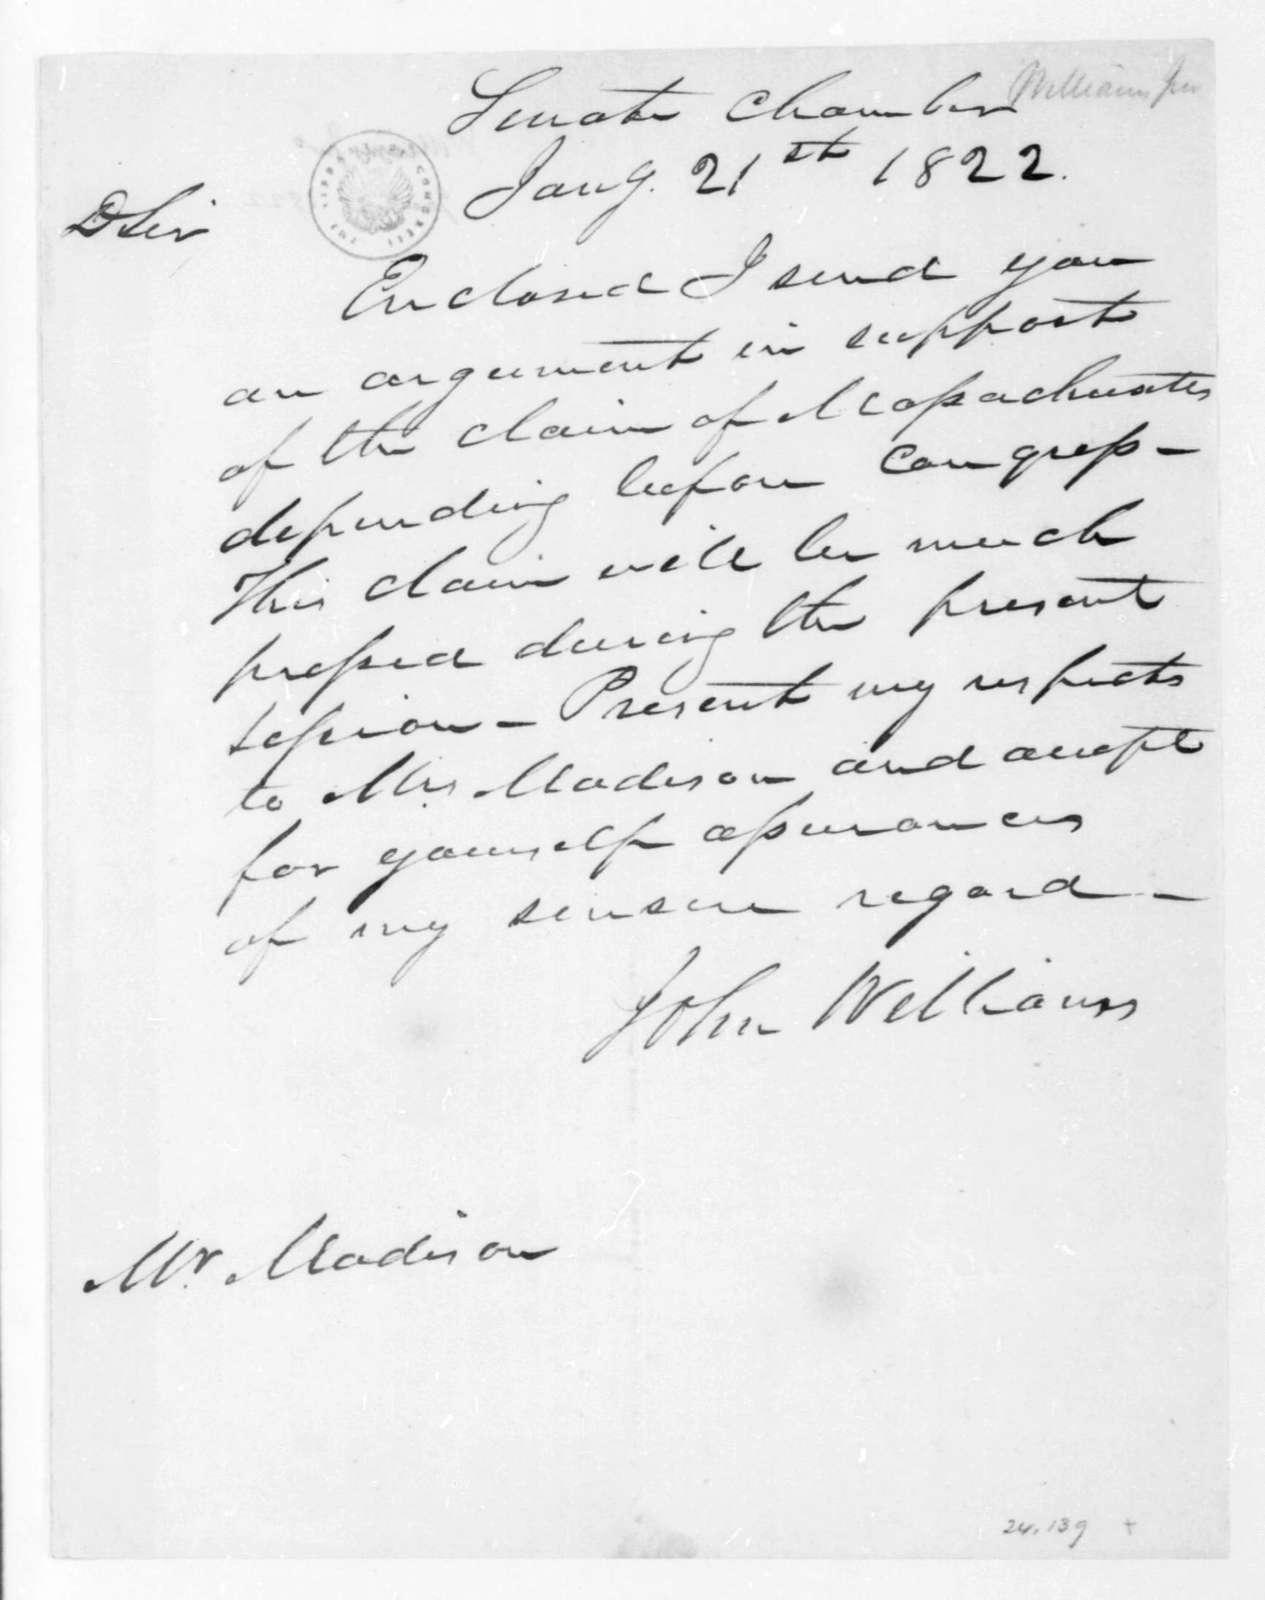 John Williams to James Madison, January 21, 1822.